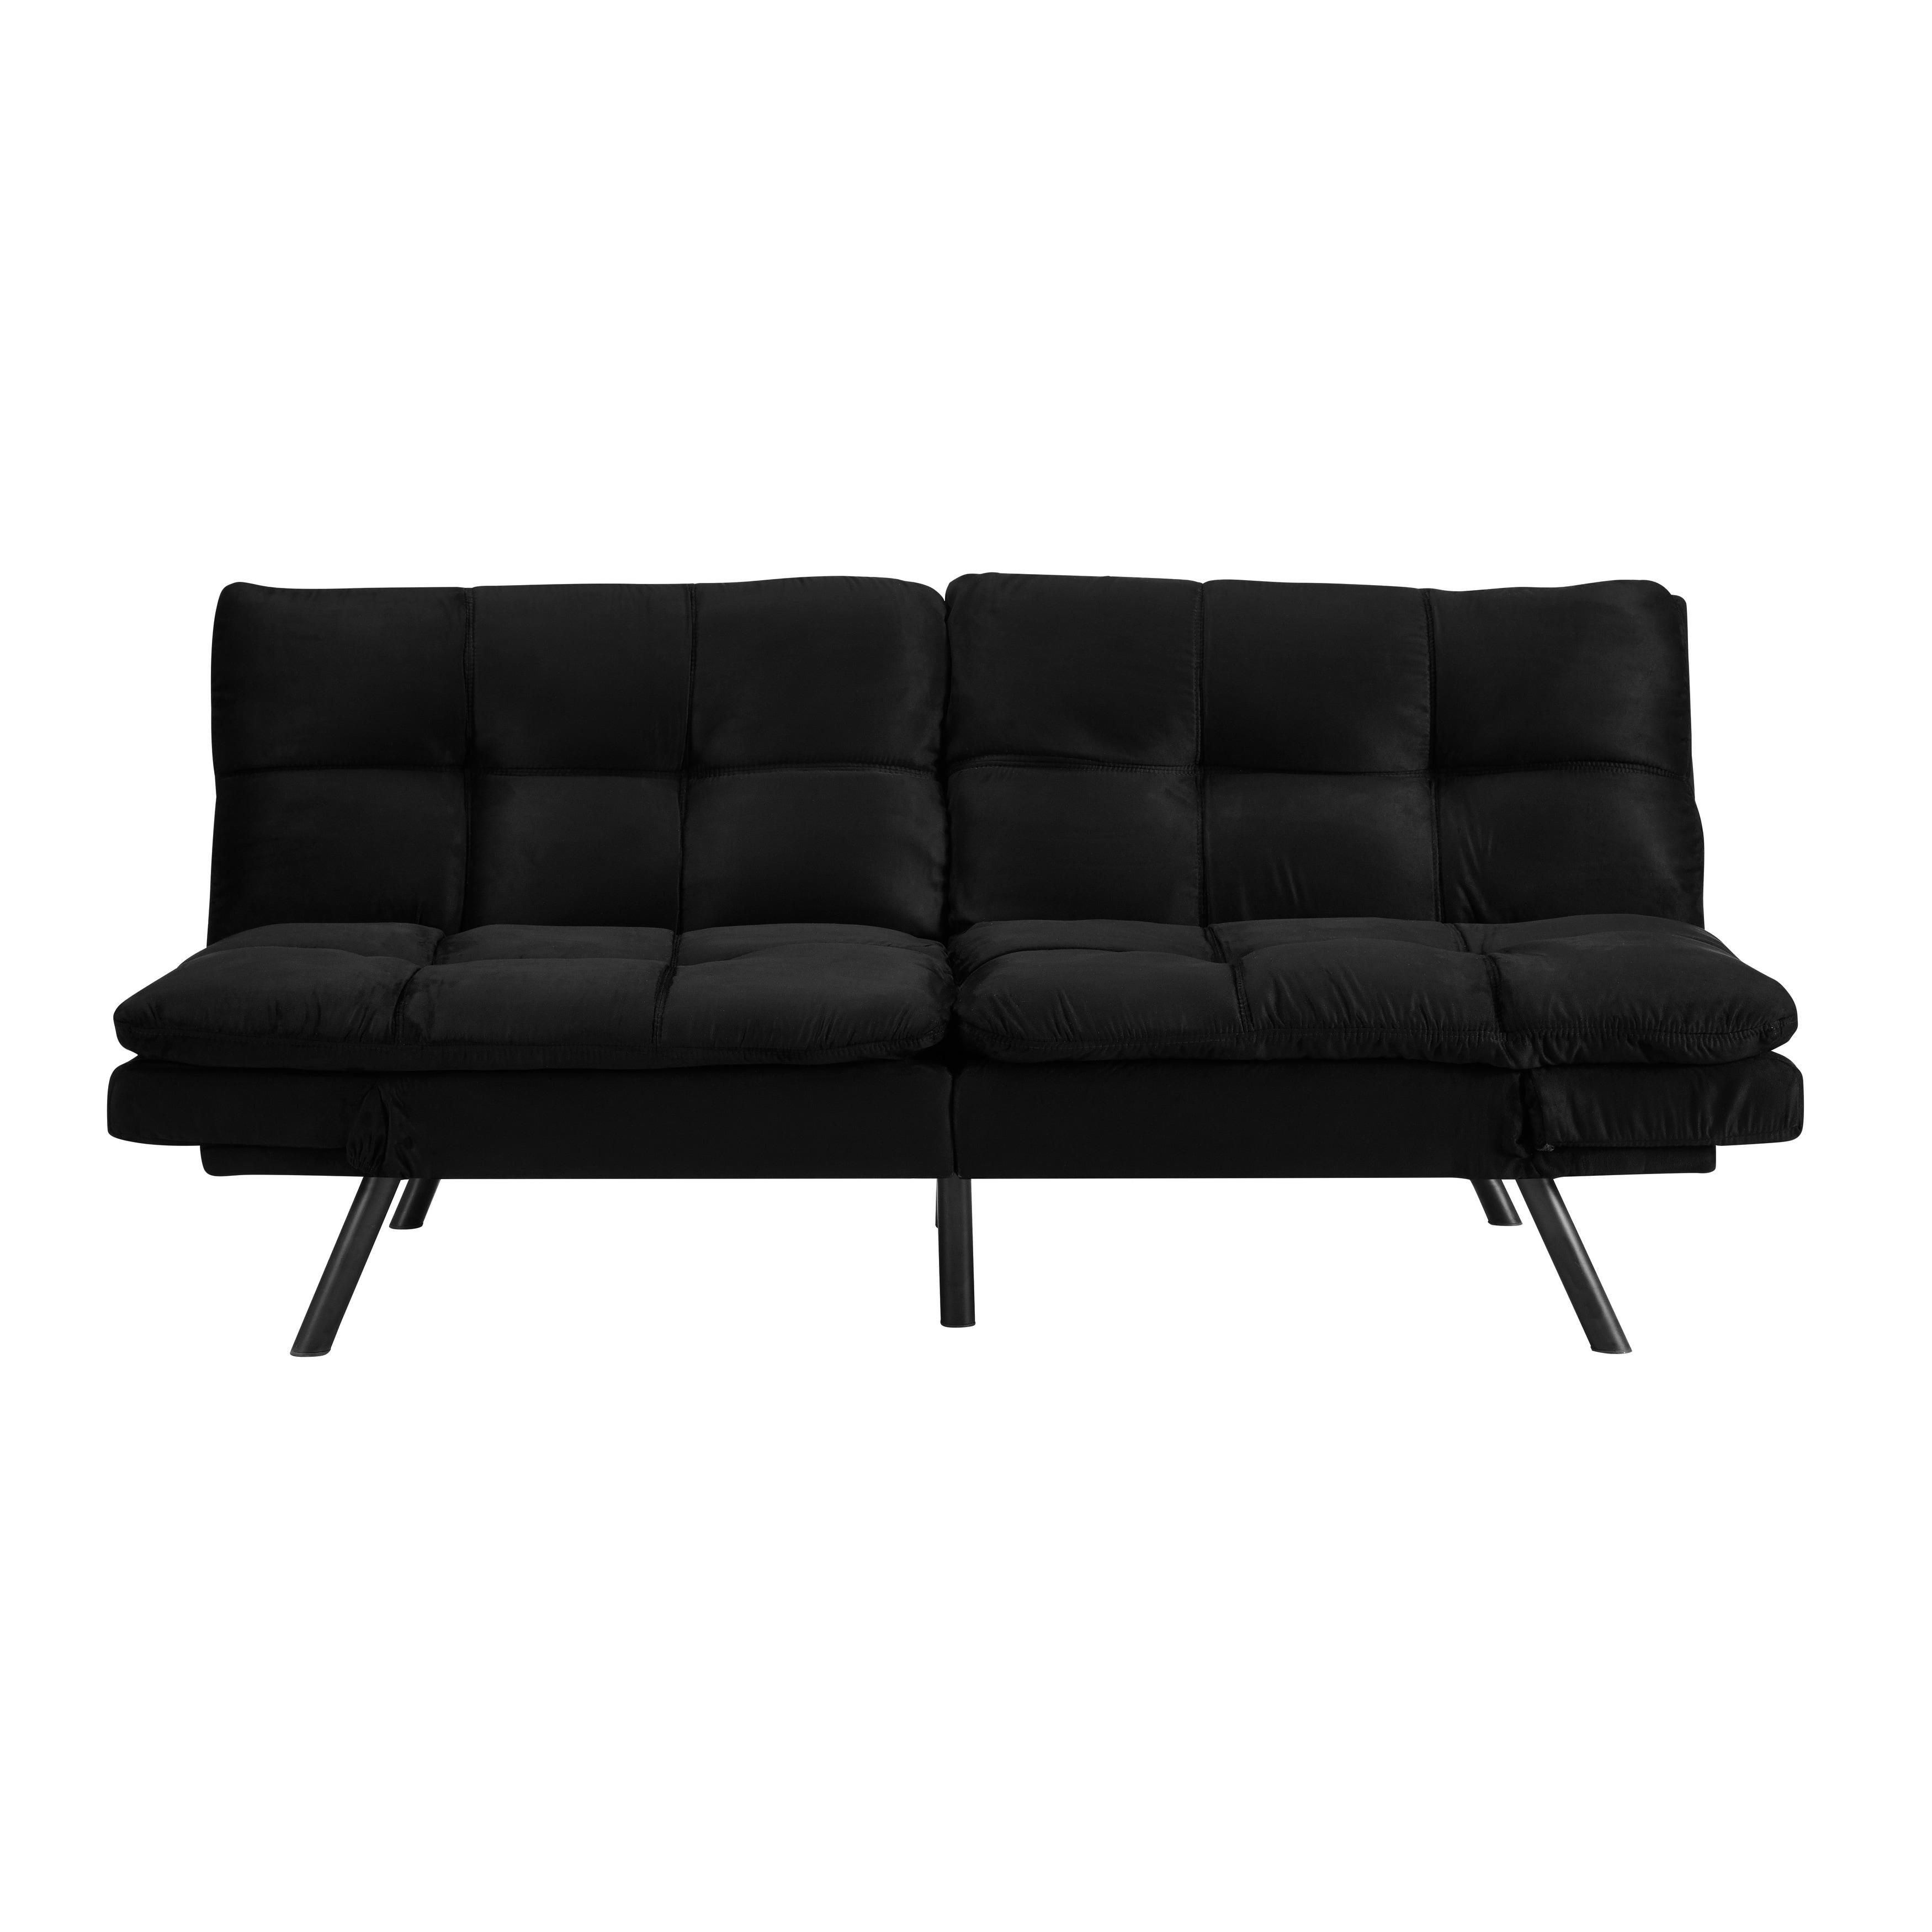 Convertible Sofa With Memory Foam